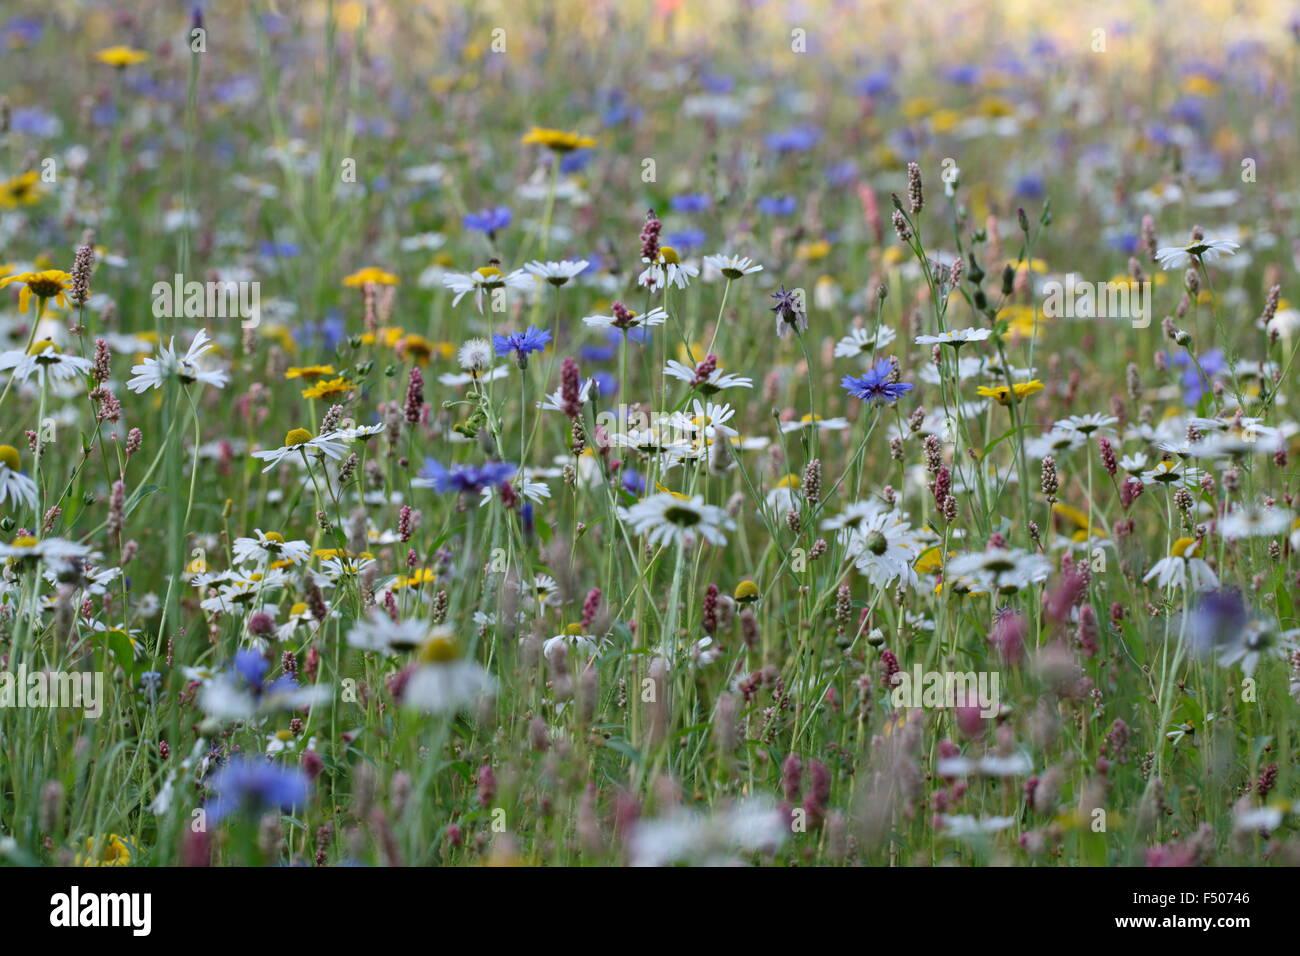 Wildflower Meadow - Stock Image